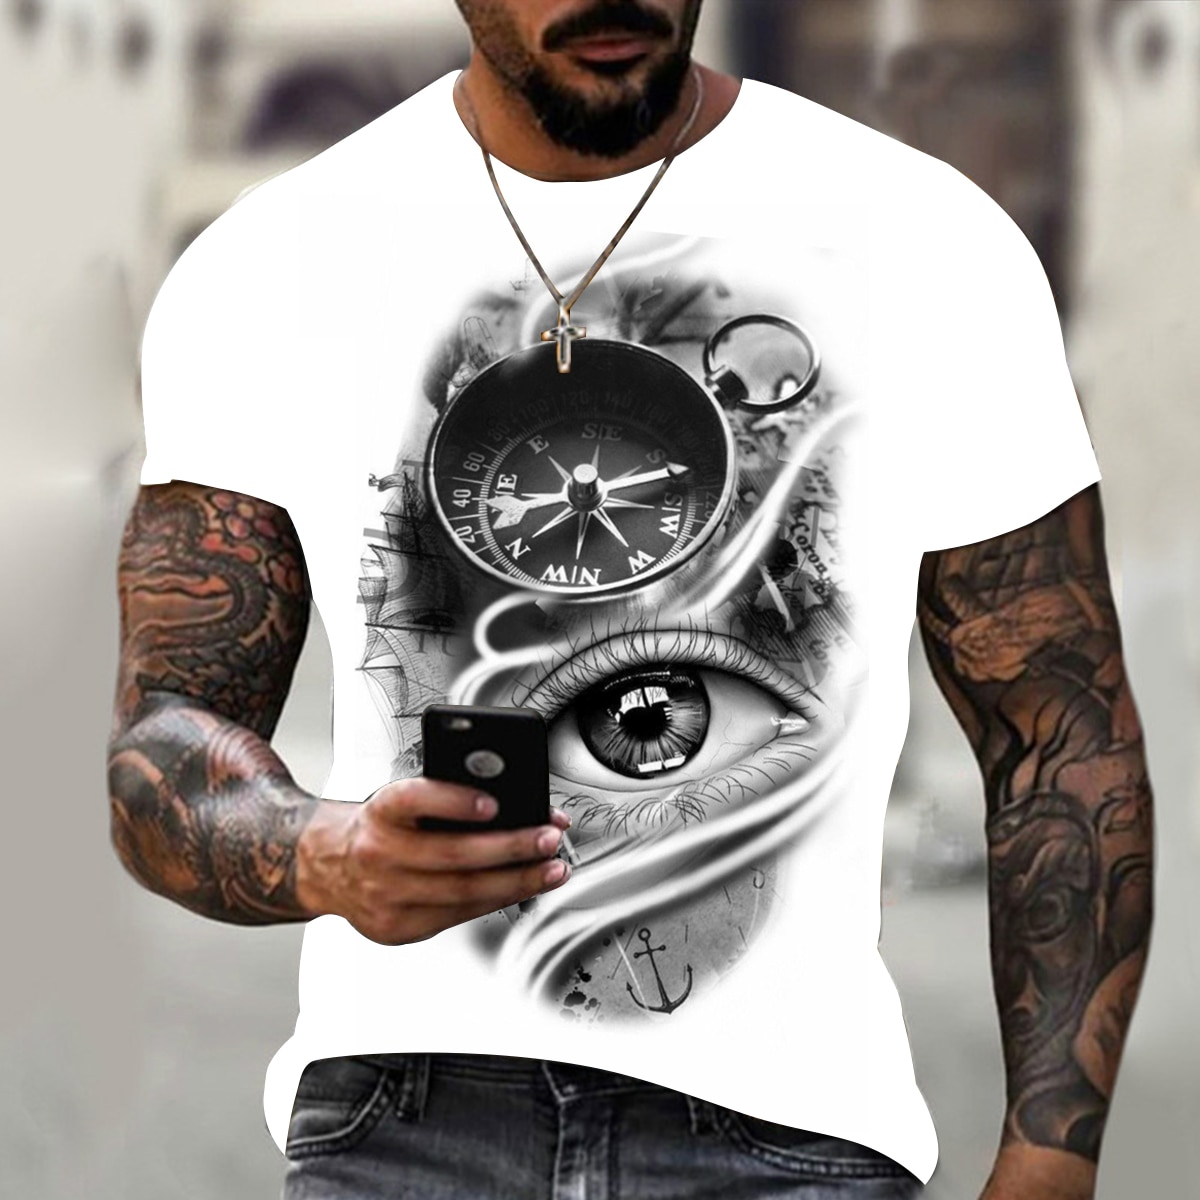 Фото - Summer hot sale fashion handsome compass 3D printing T-shirt hip-hop style men's T-shirt O-neck oversized T-shirt top xxs-6xl 2021 latest hot sale 3d cartoon print short sleeved t shirt harajuku t shirt 110 xxs 6xl